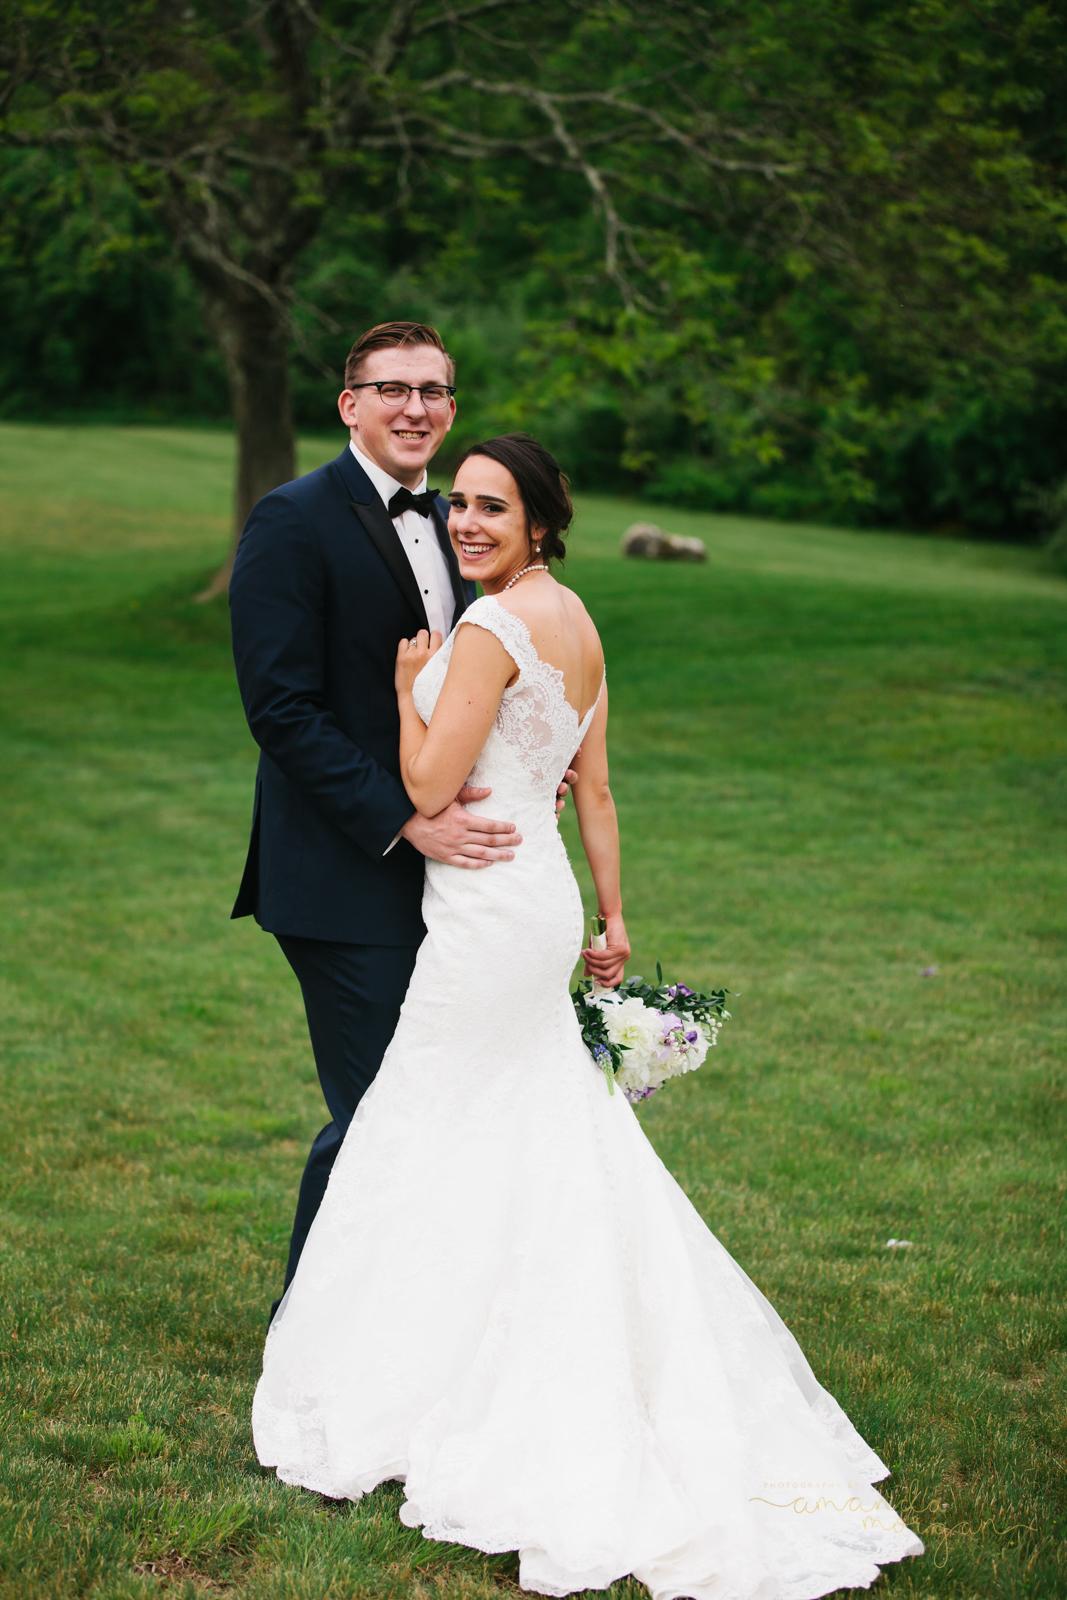 Publick-House-Wedding-Amanda-Morgan-33.jpg